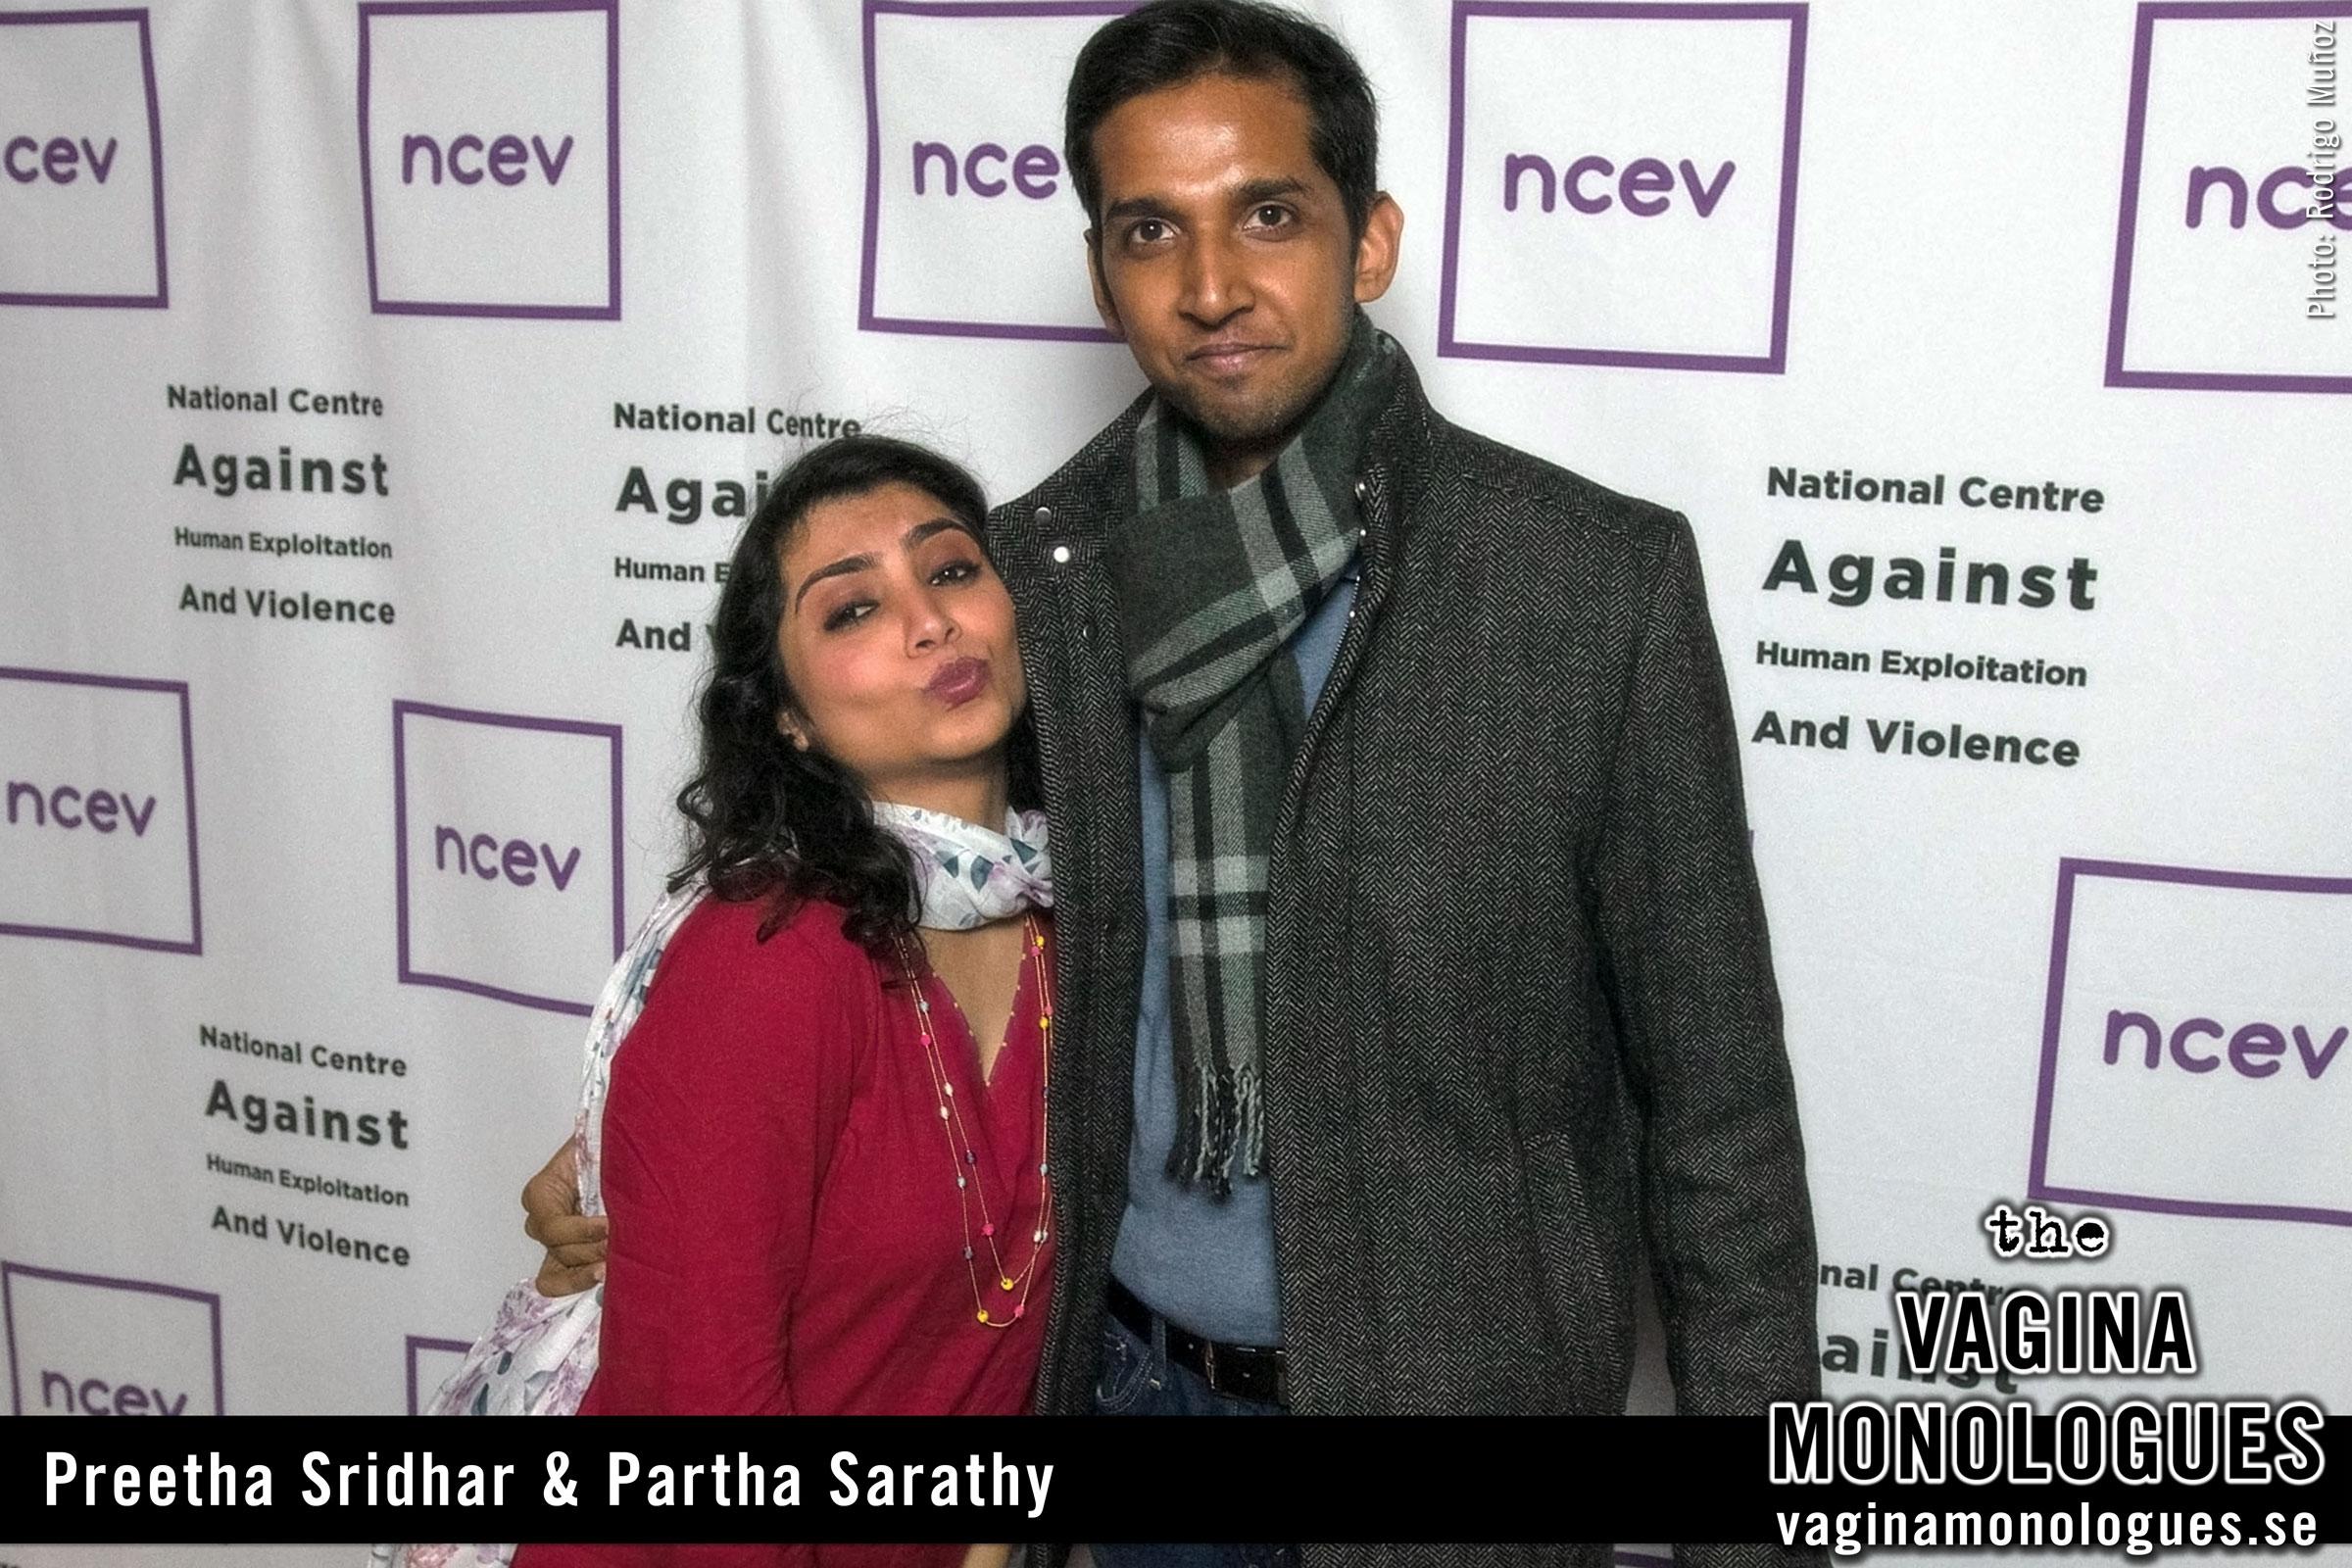 Preetha Sridhar & Partha Sarathy